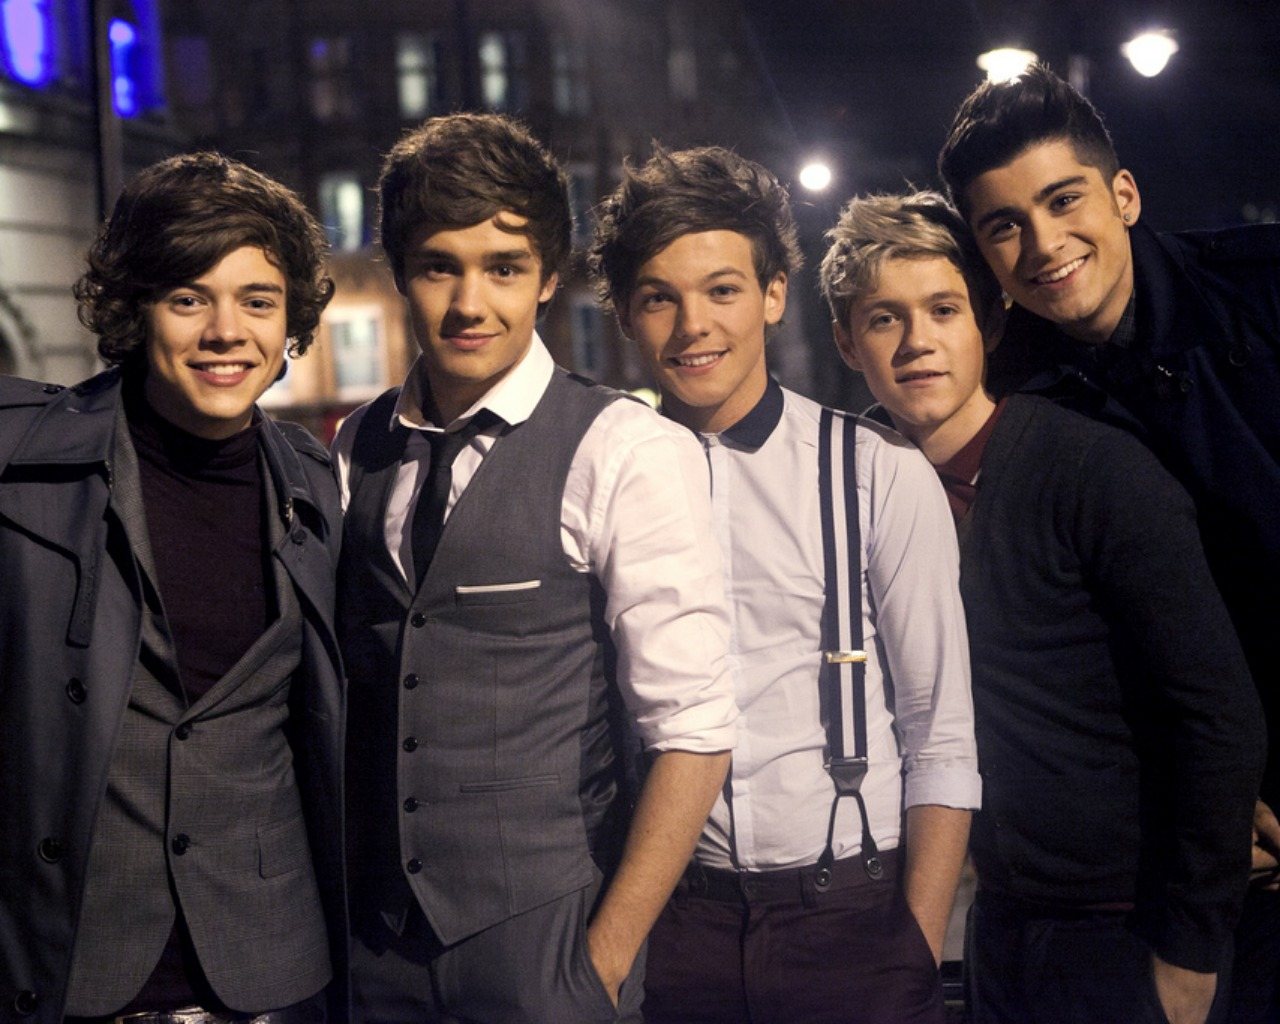 http://2.bp.blogspot.com/-BbBAaw1V9hQ/UNyWviJ3leI/AAAAAAAAIvQ/0Hs9050ADOo/s1600/One+Direction+-+grupo+musical.jpg